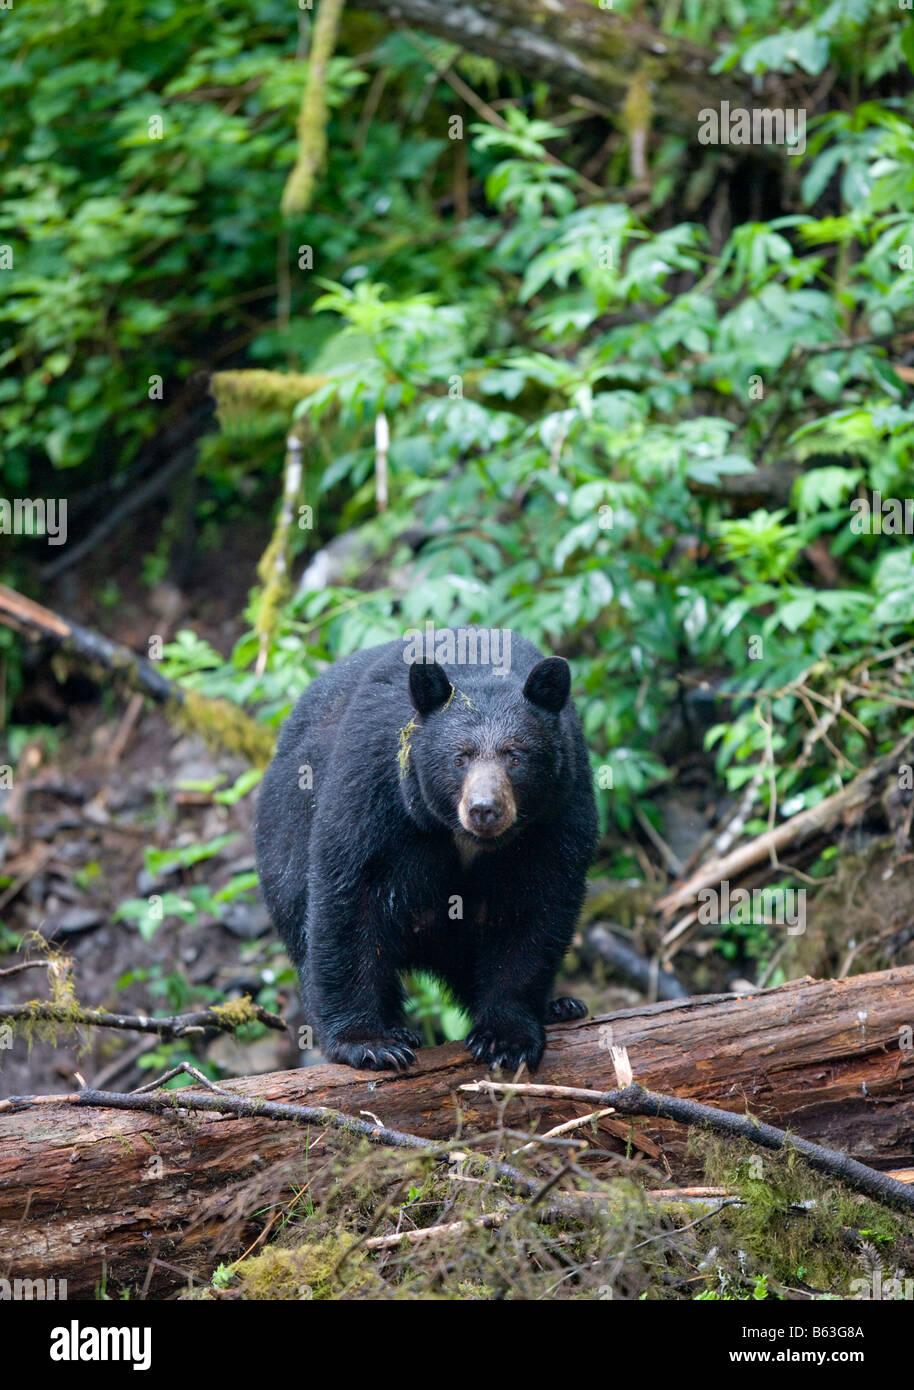 USA Alaska Kake Black Bear Ursus americanus standing balanced on log above Gunnuk Creek in early summer rain - Stock Image